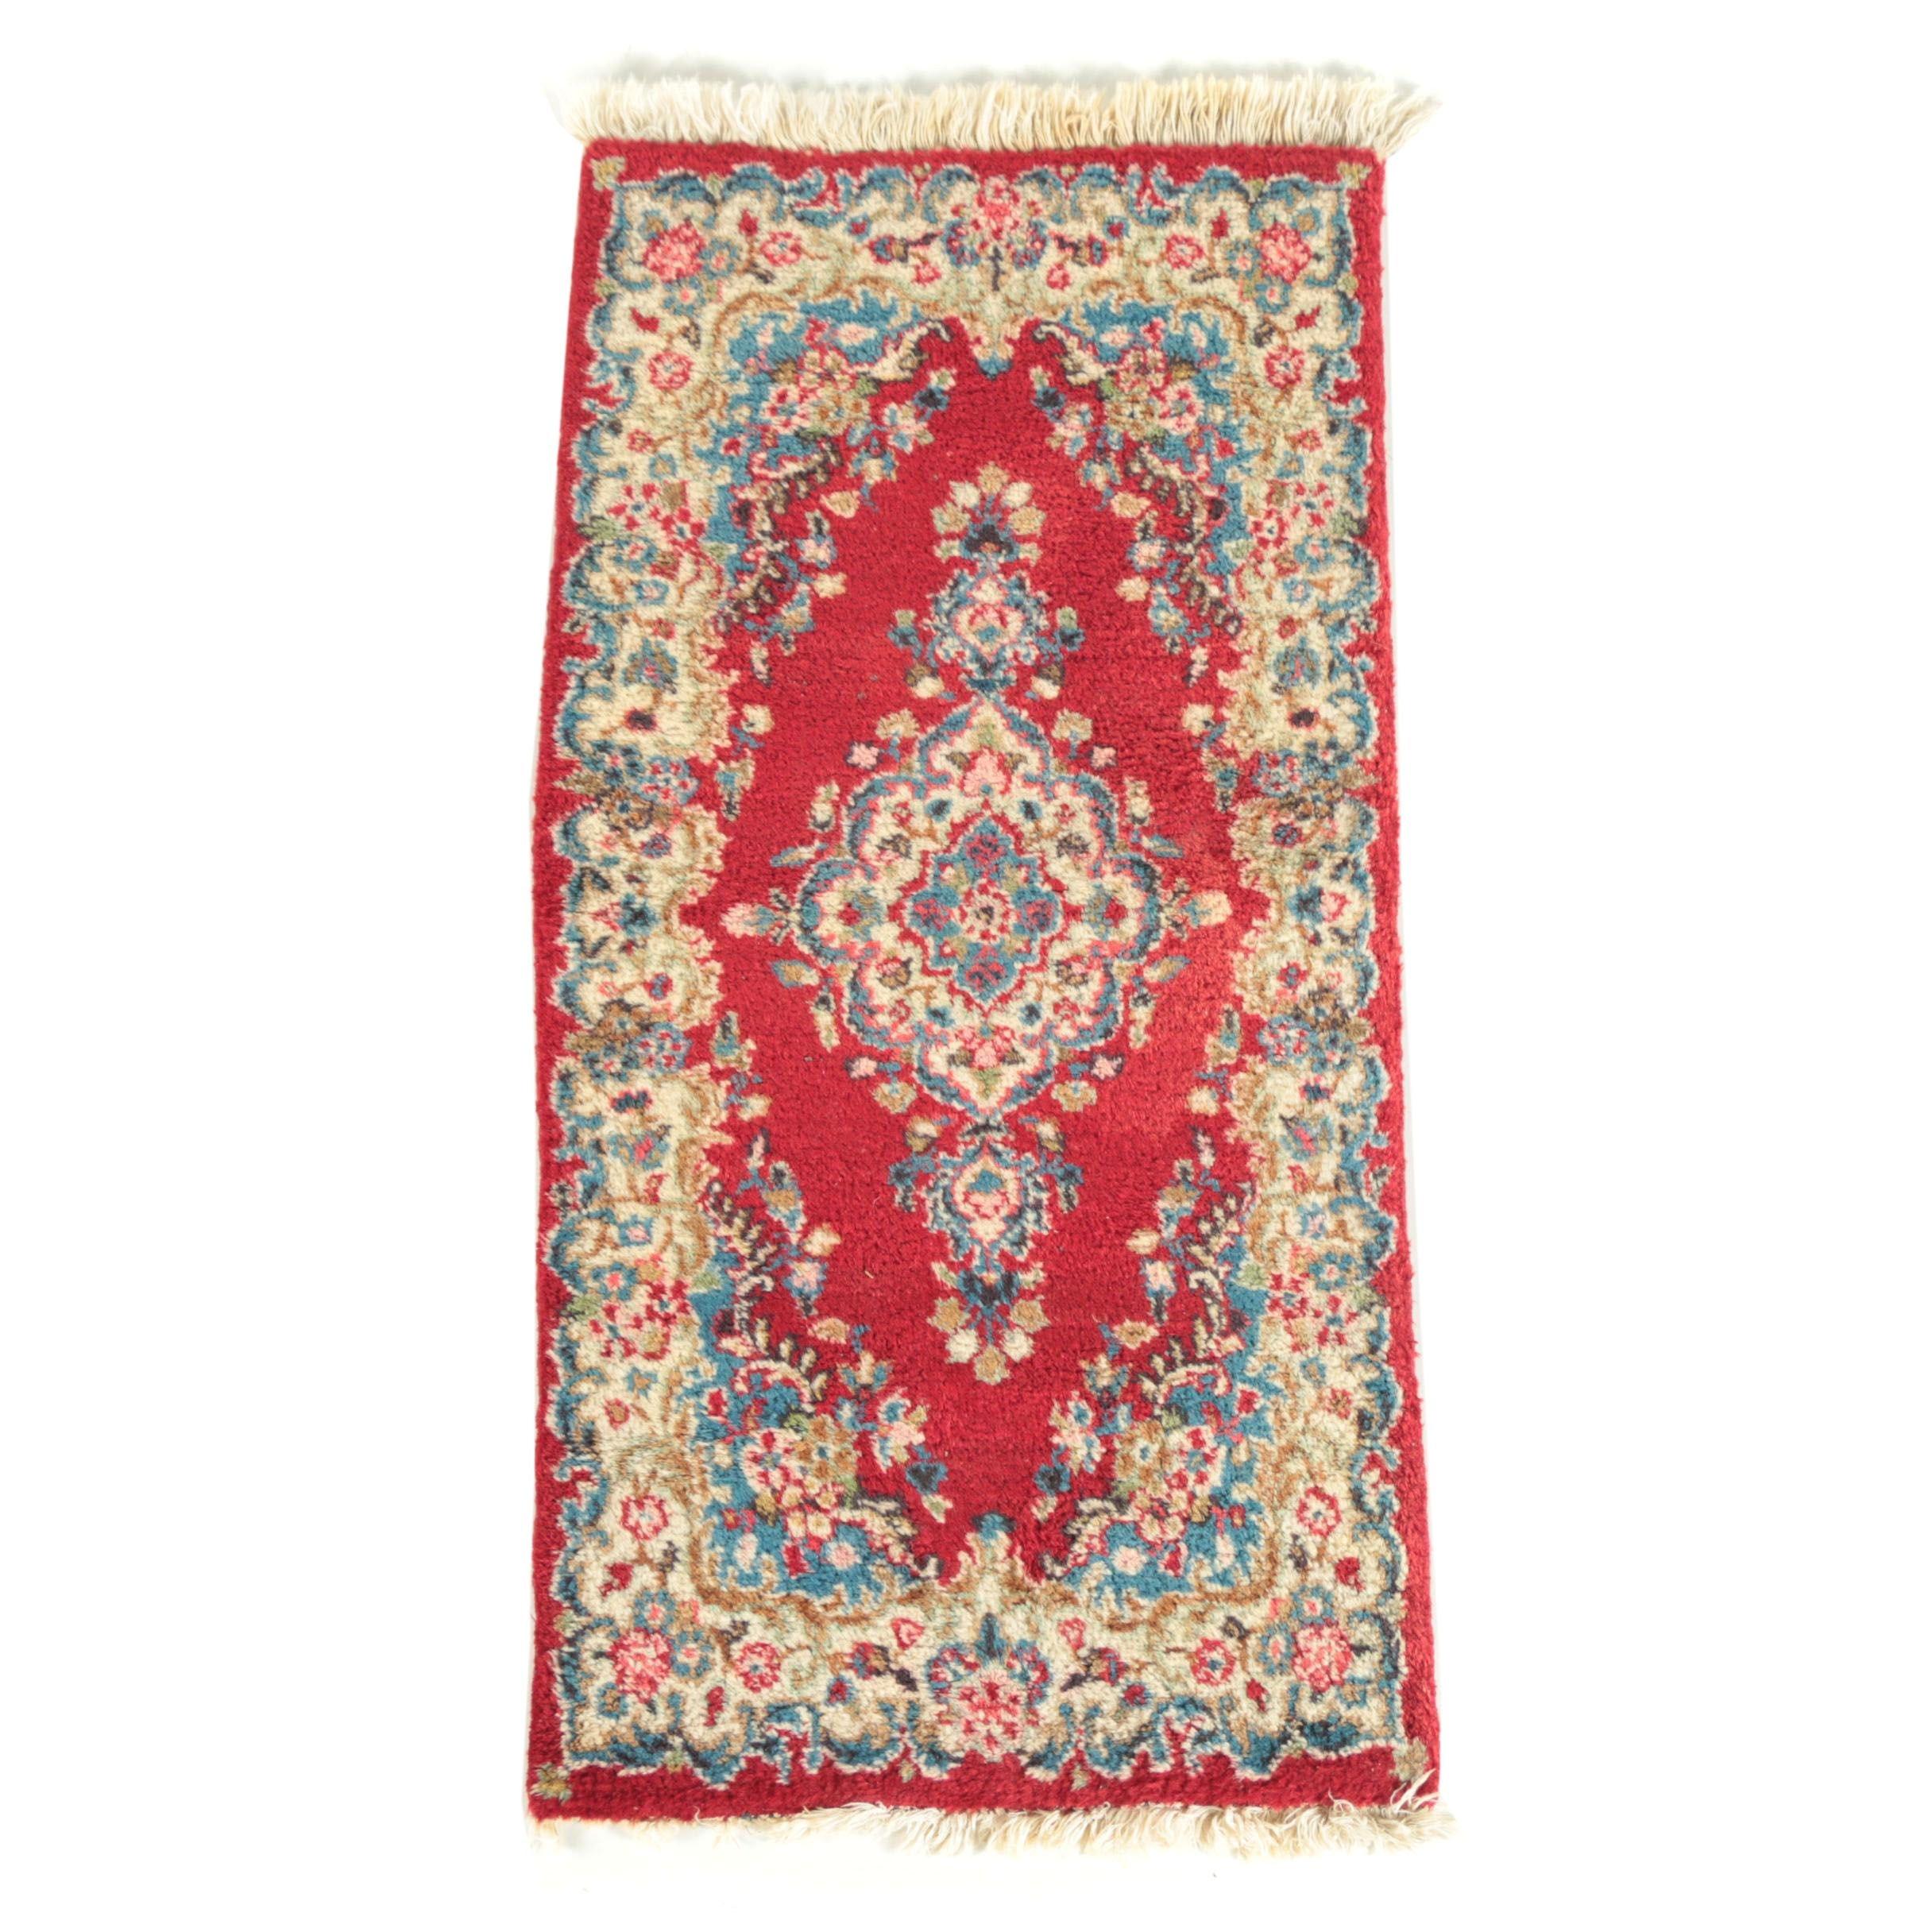 Hand-Knotted Persian Kerman Wool Rug